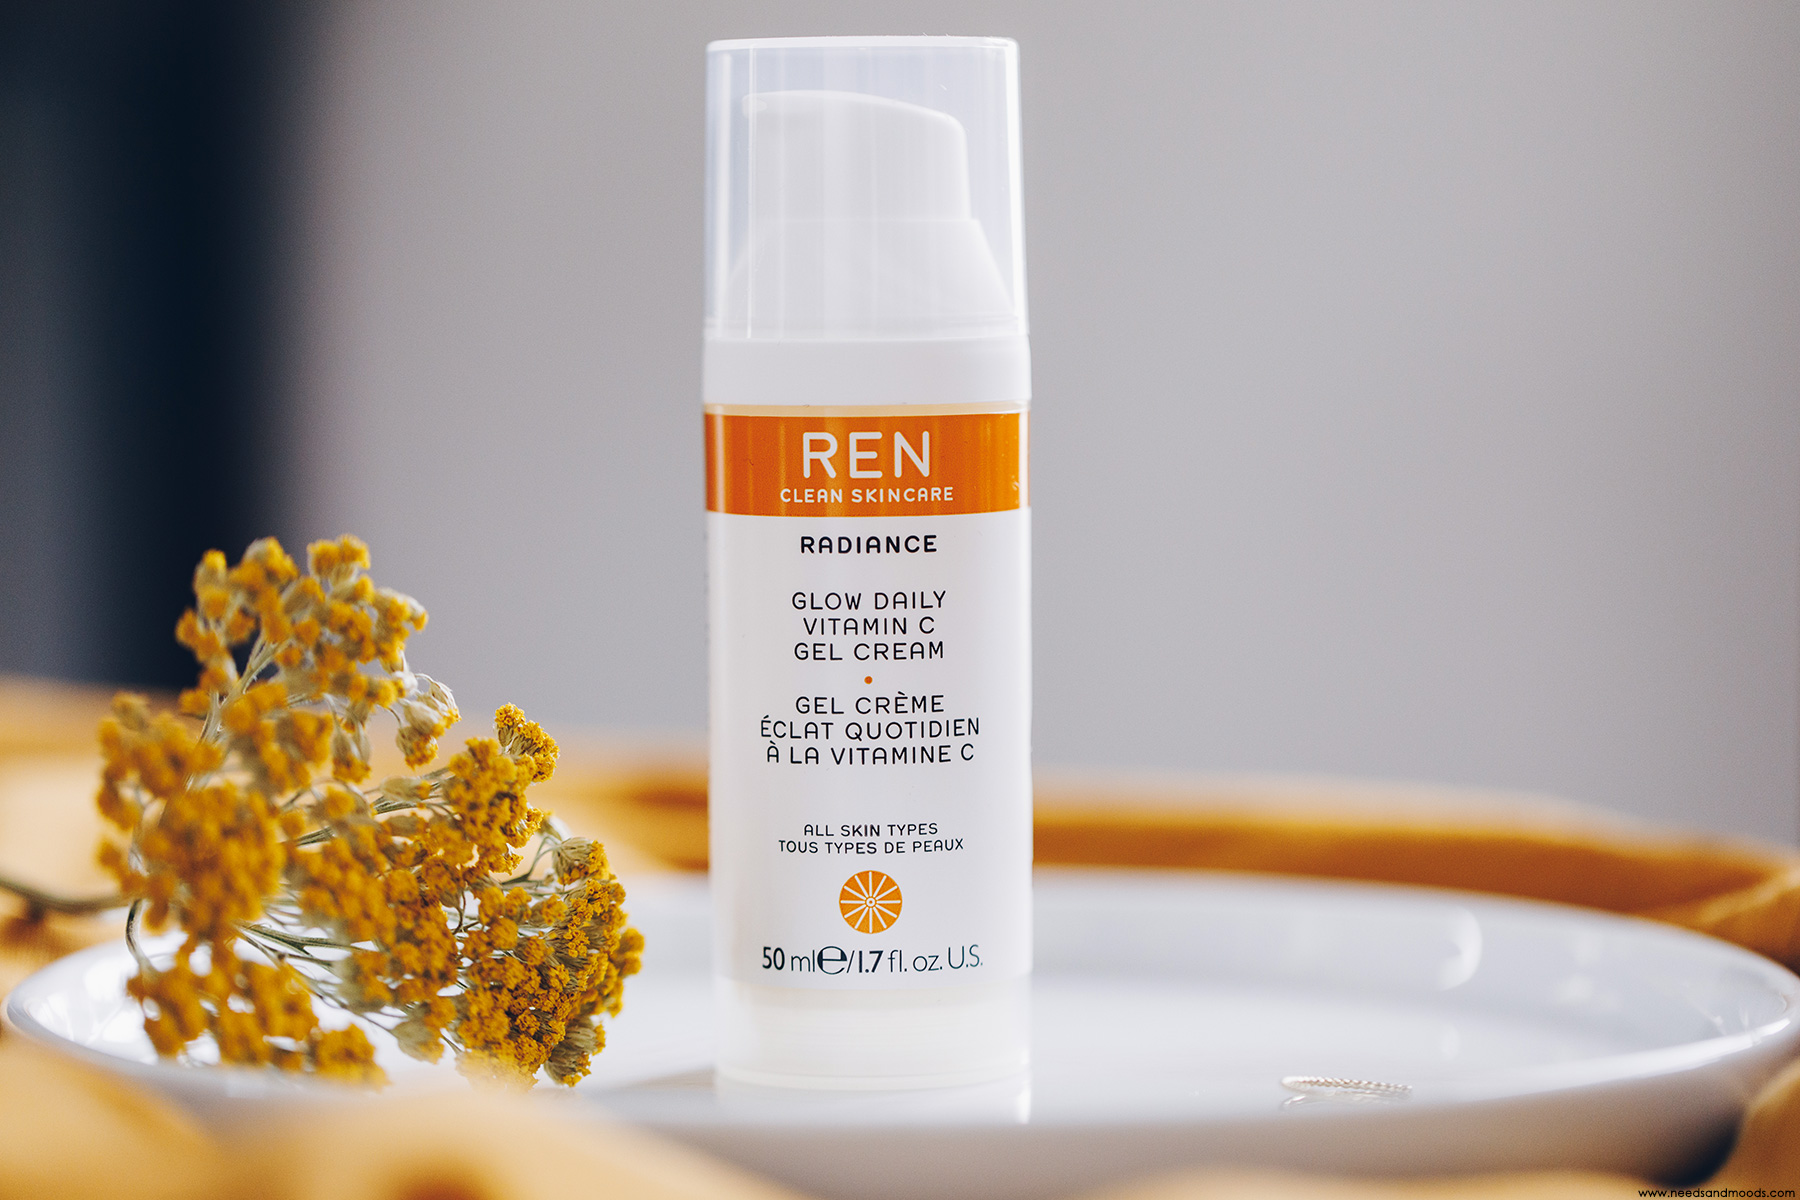 REN Skincare Glow Daily Vitamine C Gel Cream